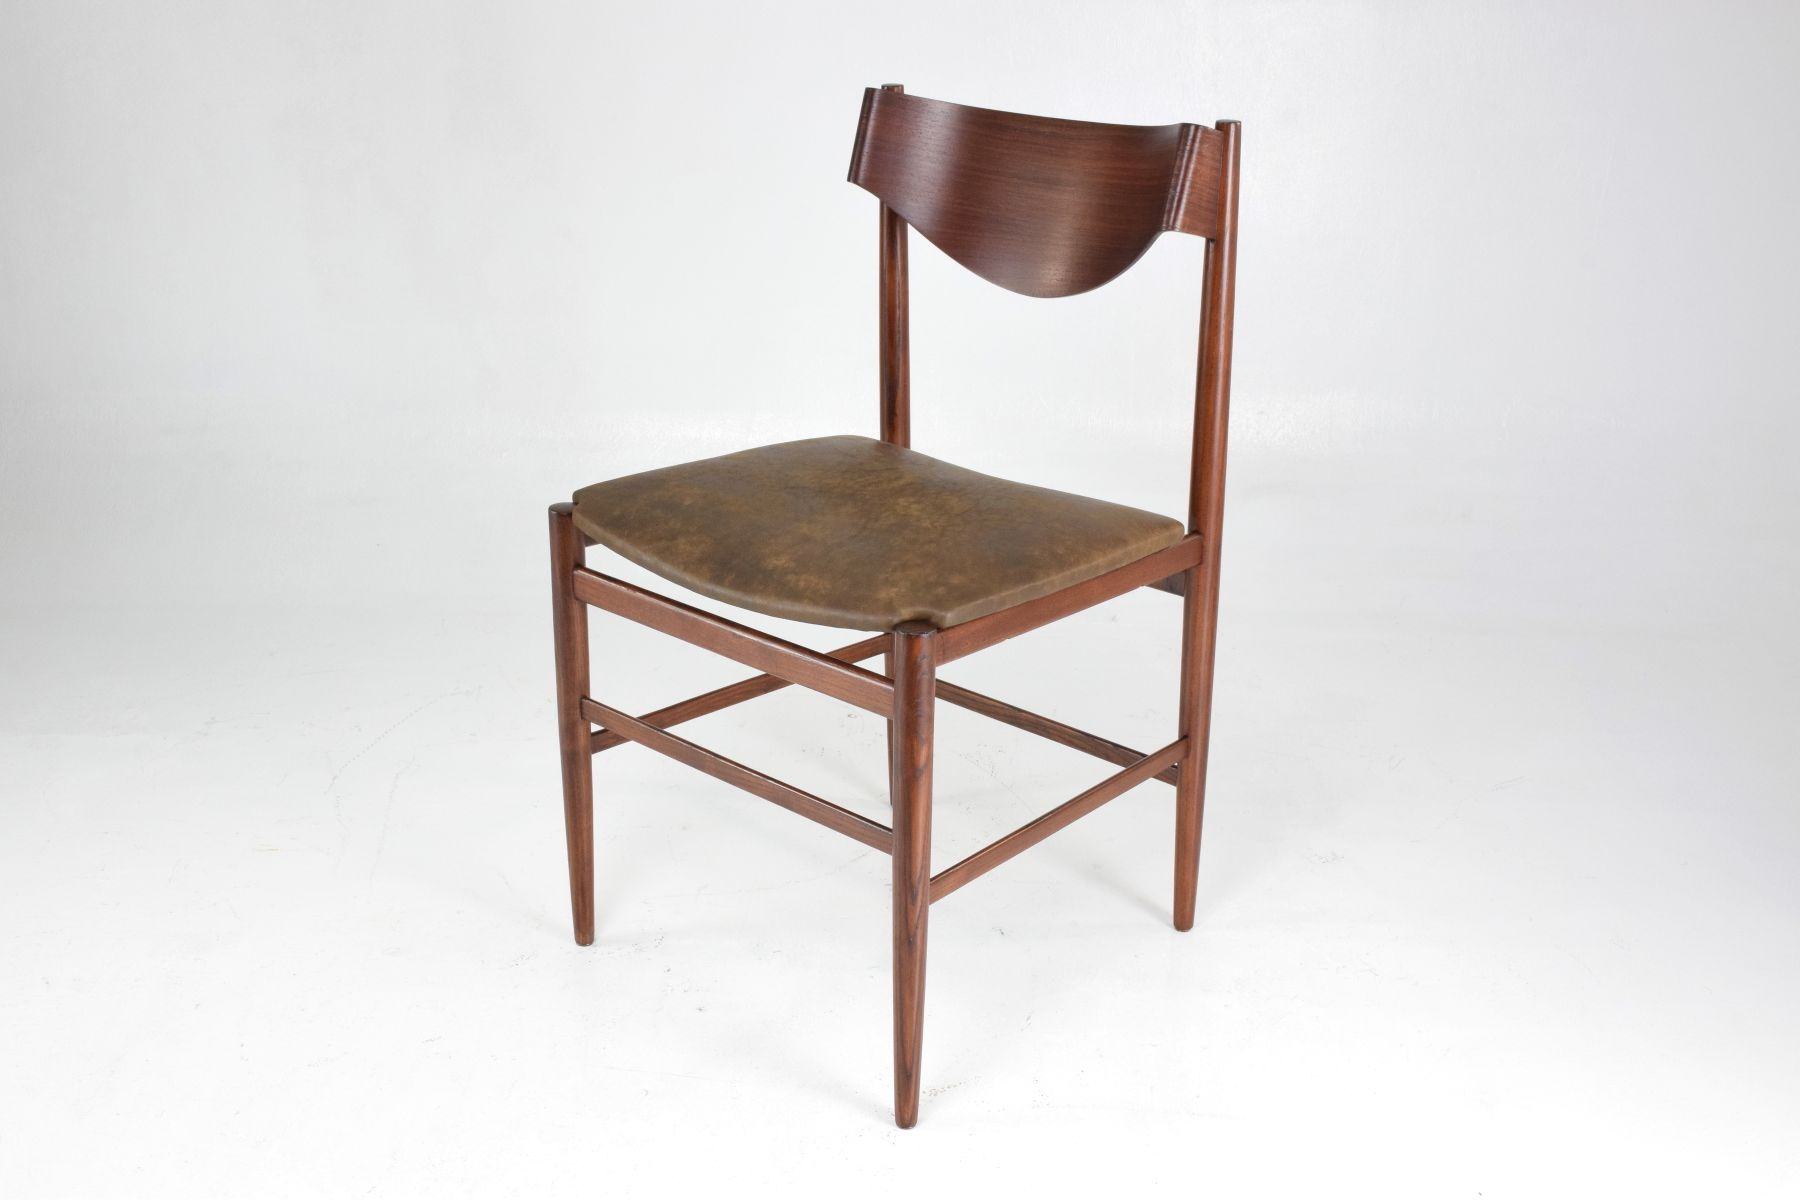 esszimmer st hle von gianfranco frattini f r cassina 1960er 5er set bei pamono kaufen. Black Bedroom Furniture Sets. Home Design Ideas